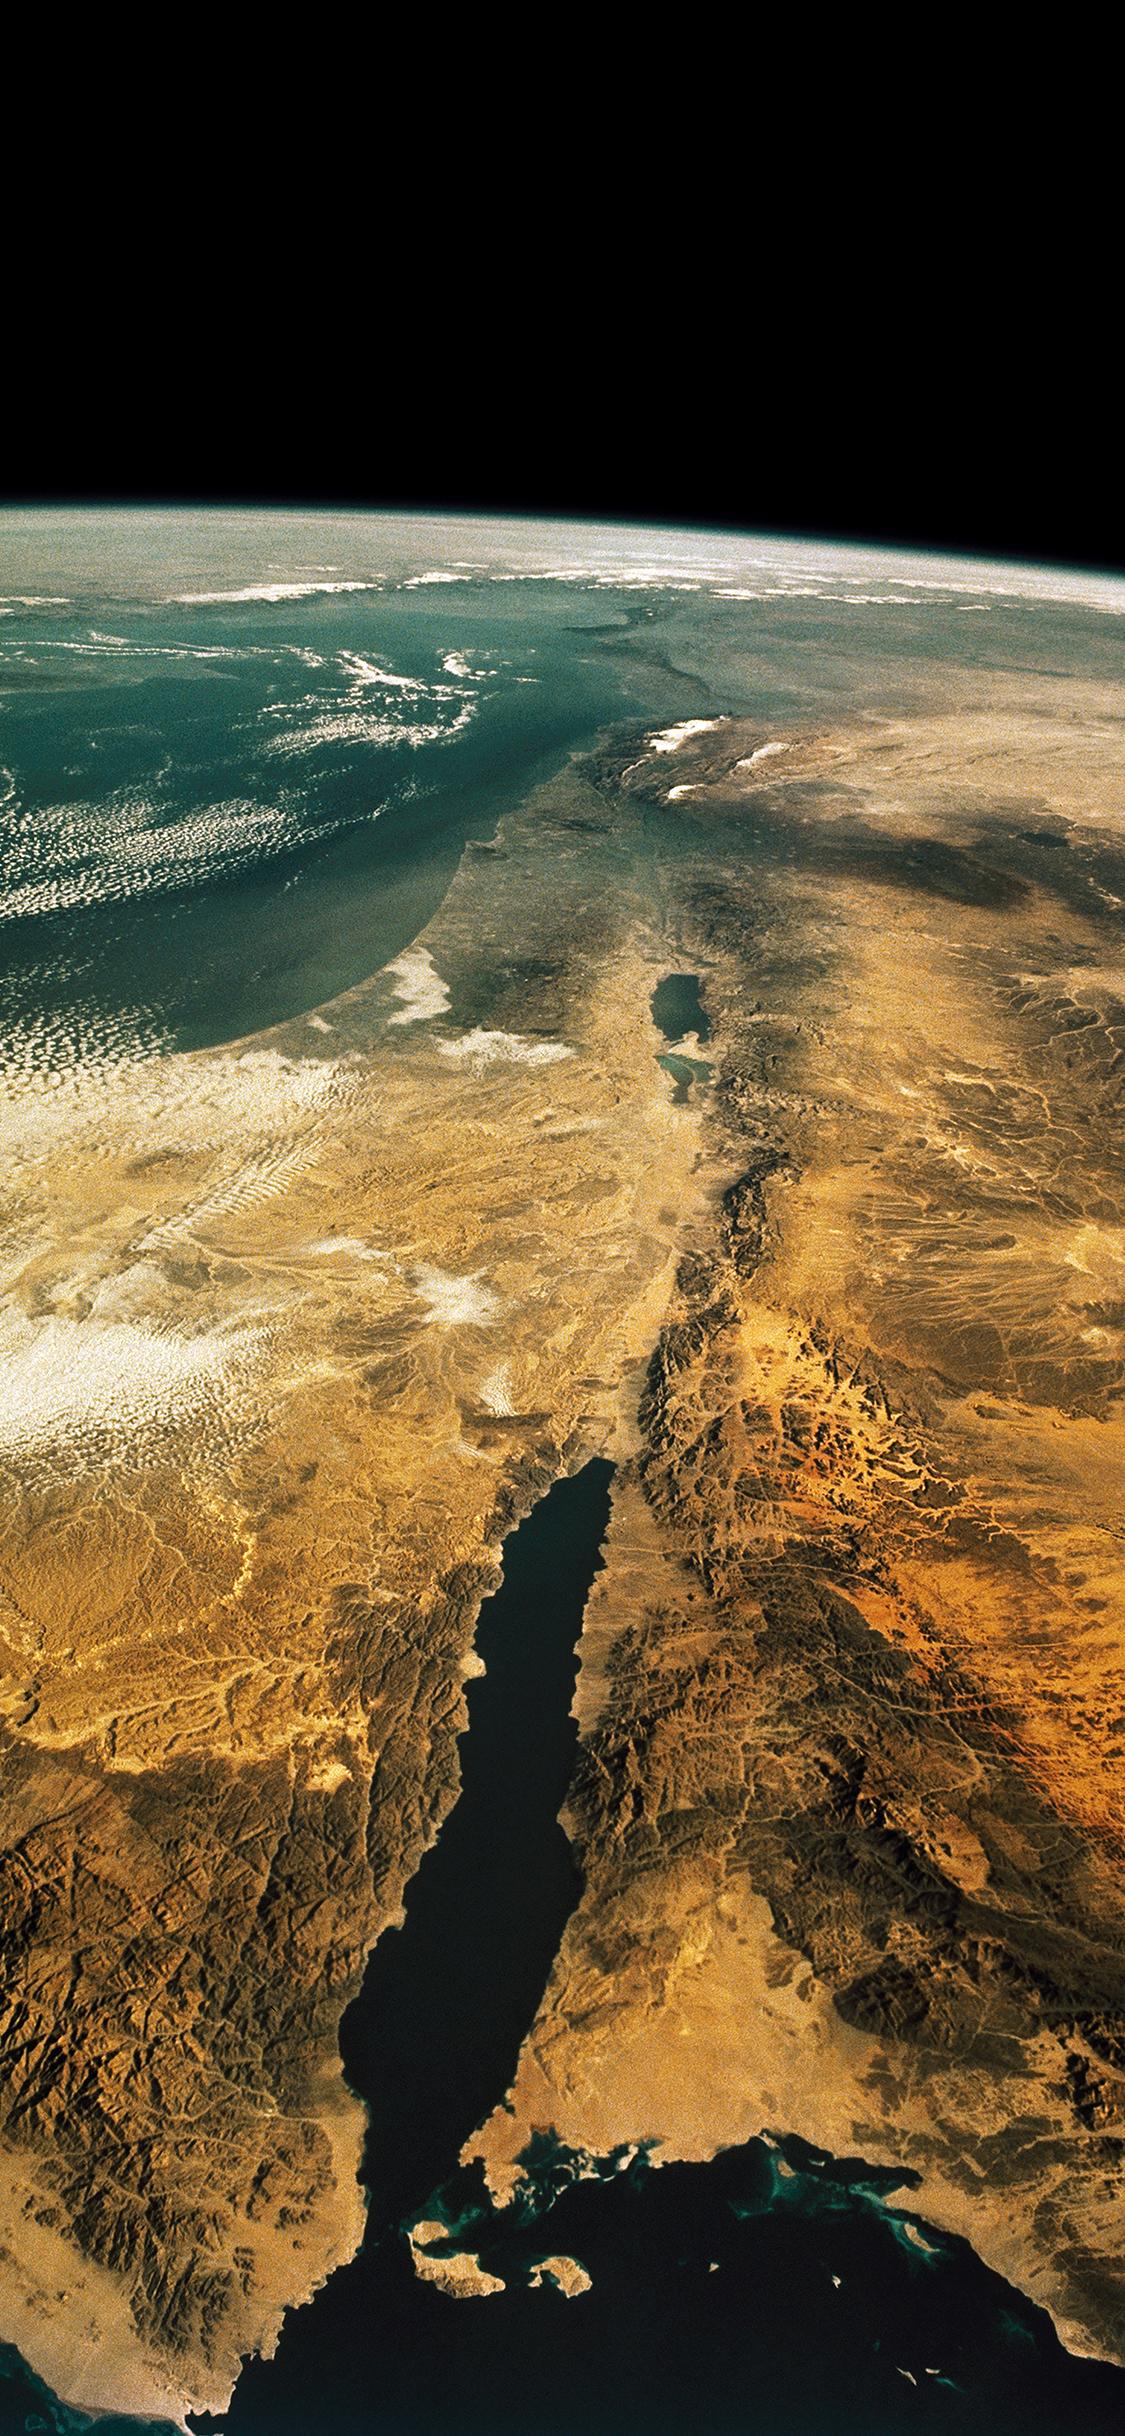 iPhonexpapers.com-Apple-iPhone-wallpaper-ml29-space-earth-top-nature-interstellar